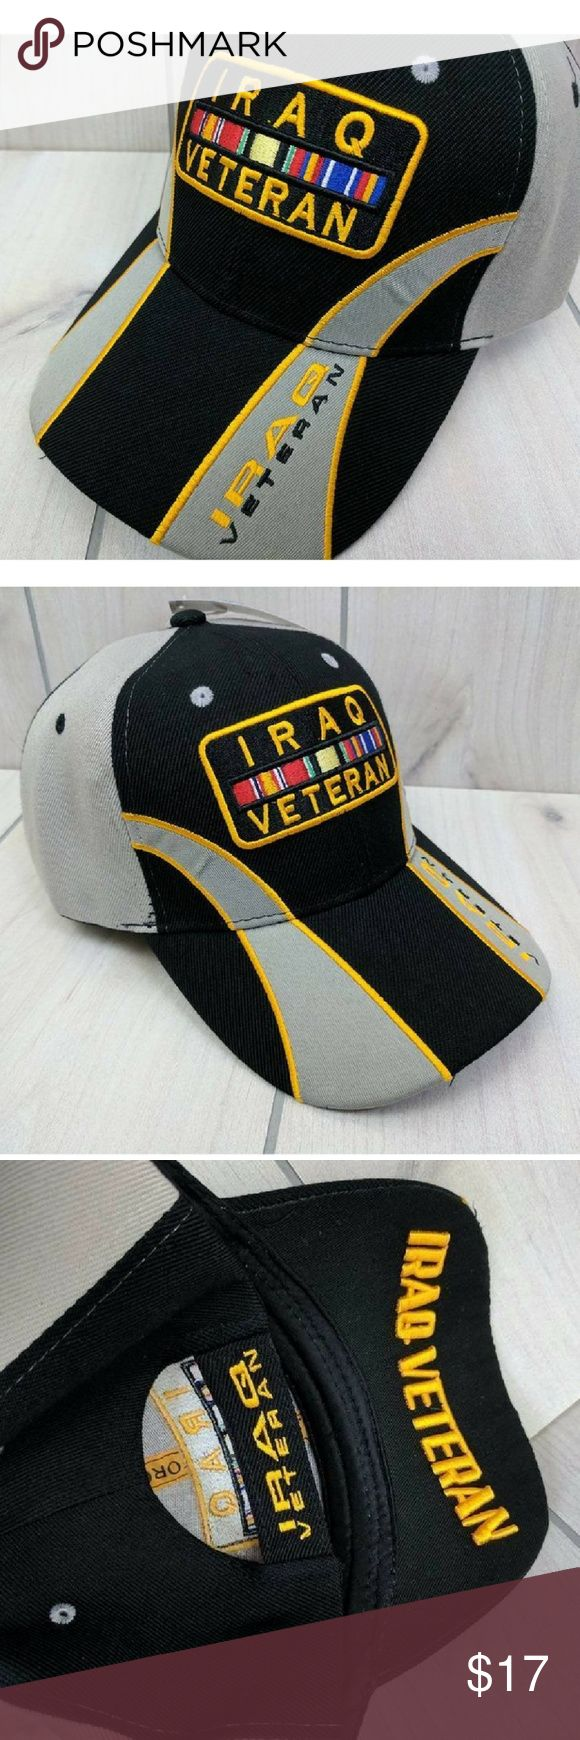 Iraq  Veteran Hat Baseball Cap Adjustable NWT Iraq Veteran adjustable hat. US Services Brigade Medal Ribbons. Smoke free. New with tags. Accessories Hats